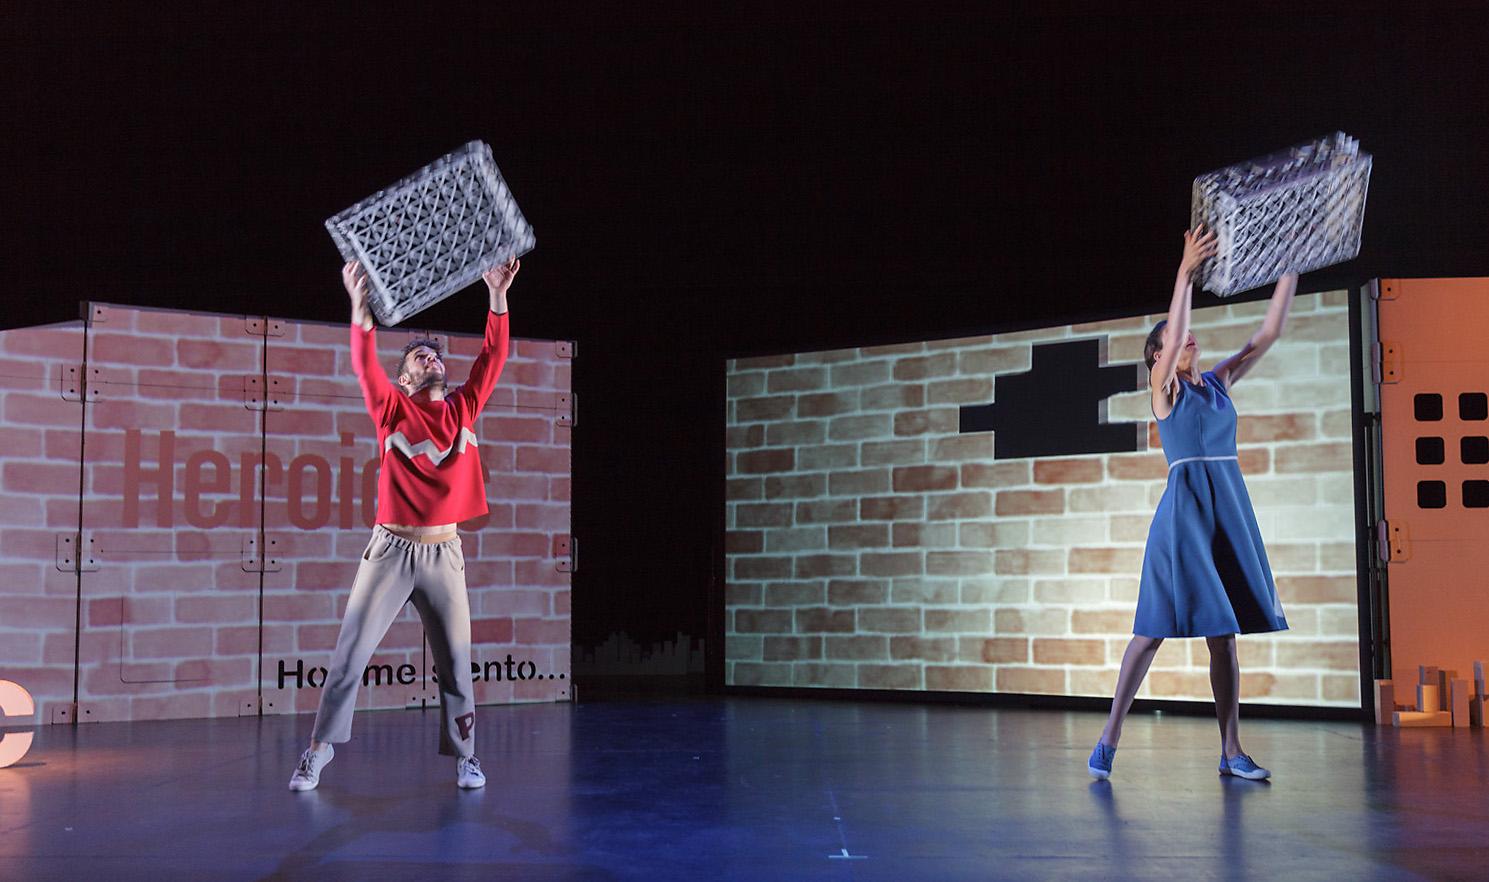 escenografia carton obra teatro actuacion ruido interno